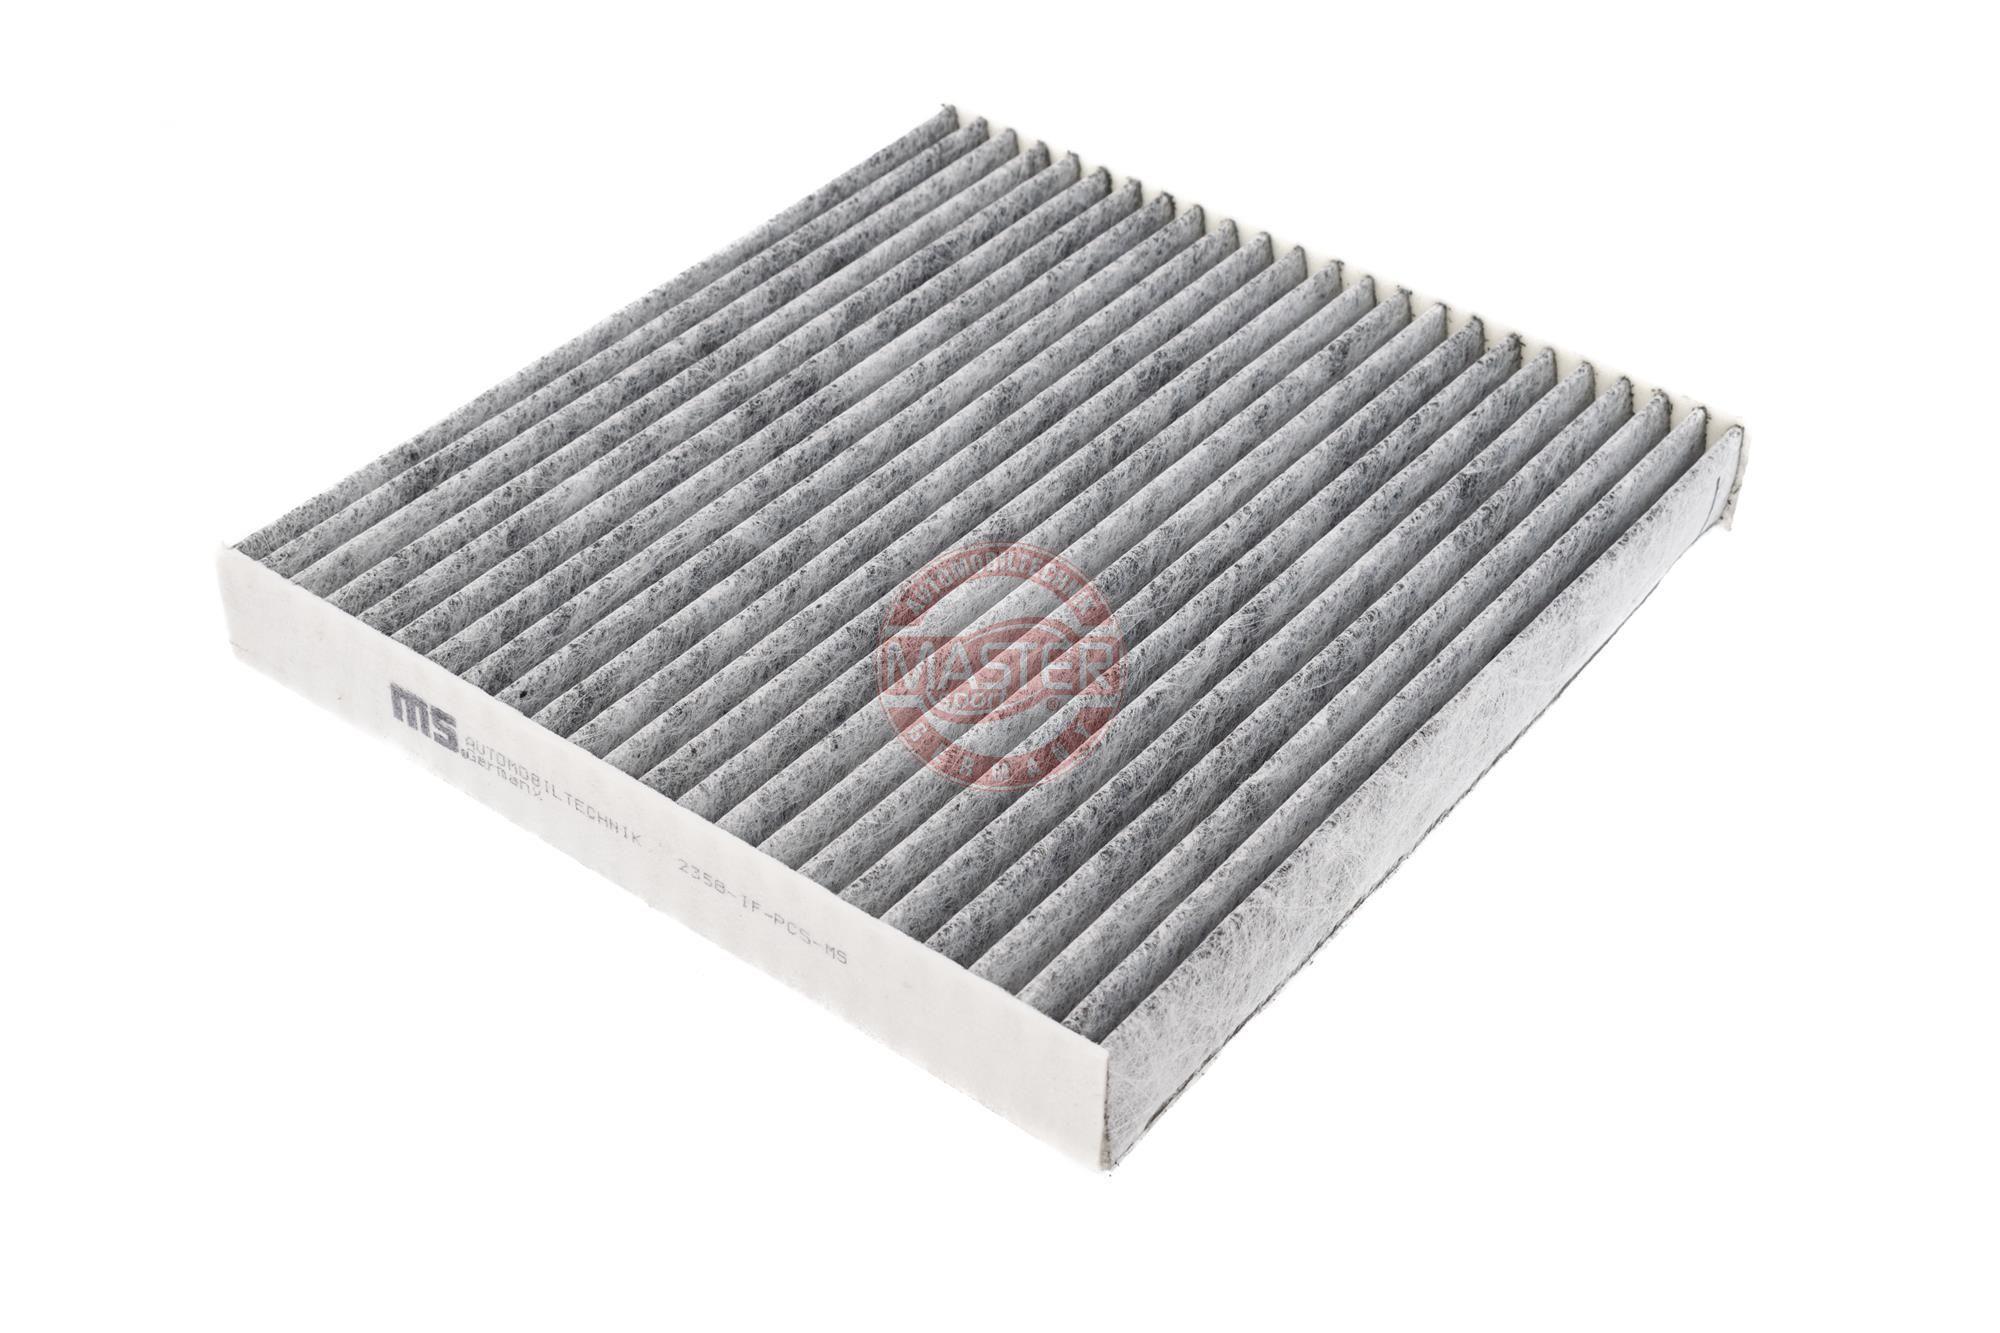 Innenraumfilter 2358-IF-PCS-MS MASTER-SPORT 420023580 in Original Qualität